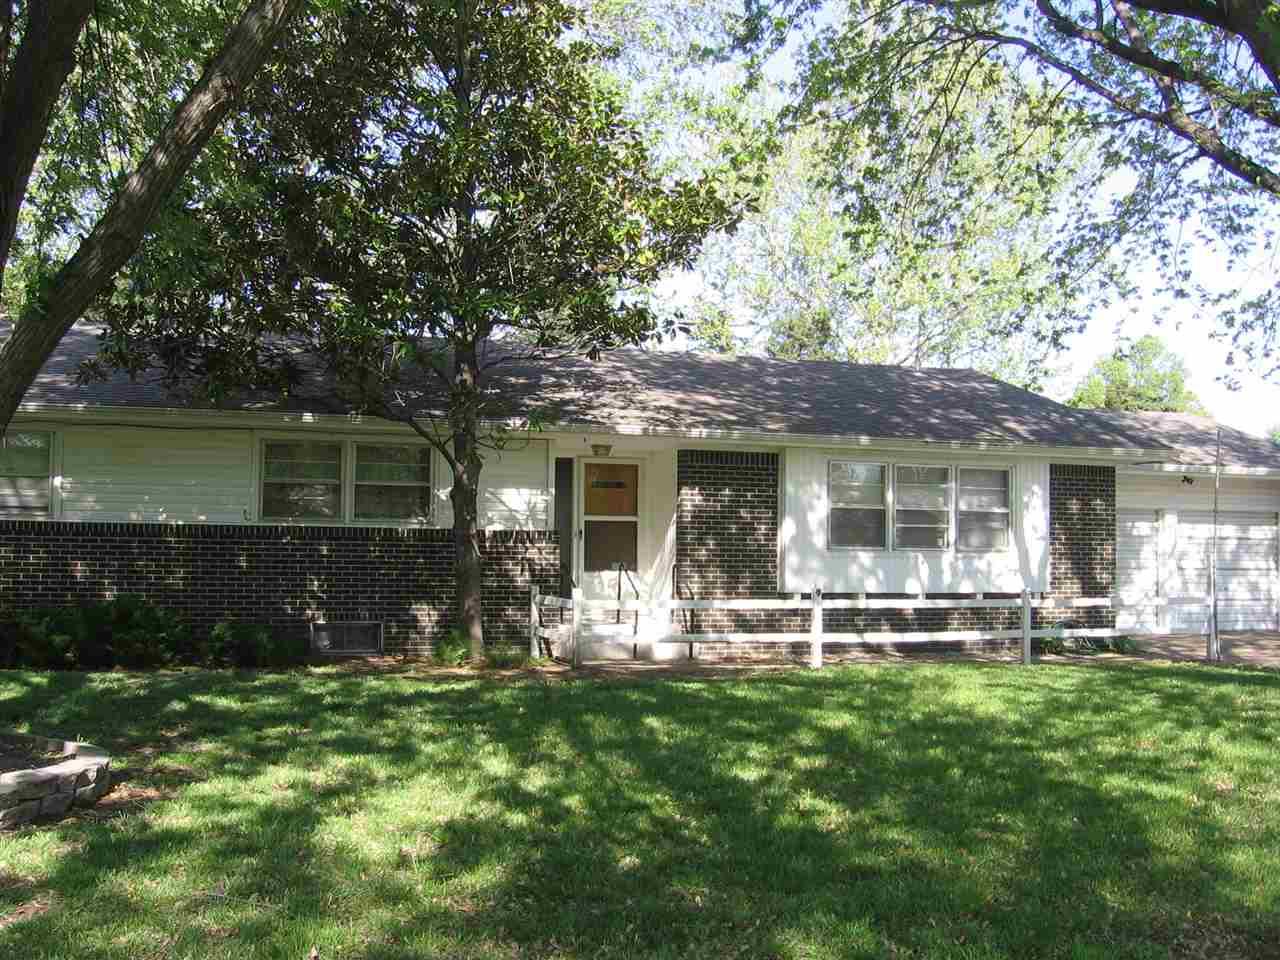 3959 N Clarence Ave, Wichita, KS 67204